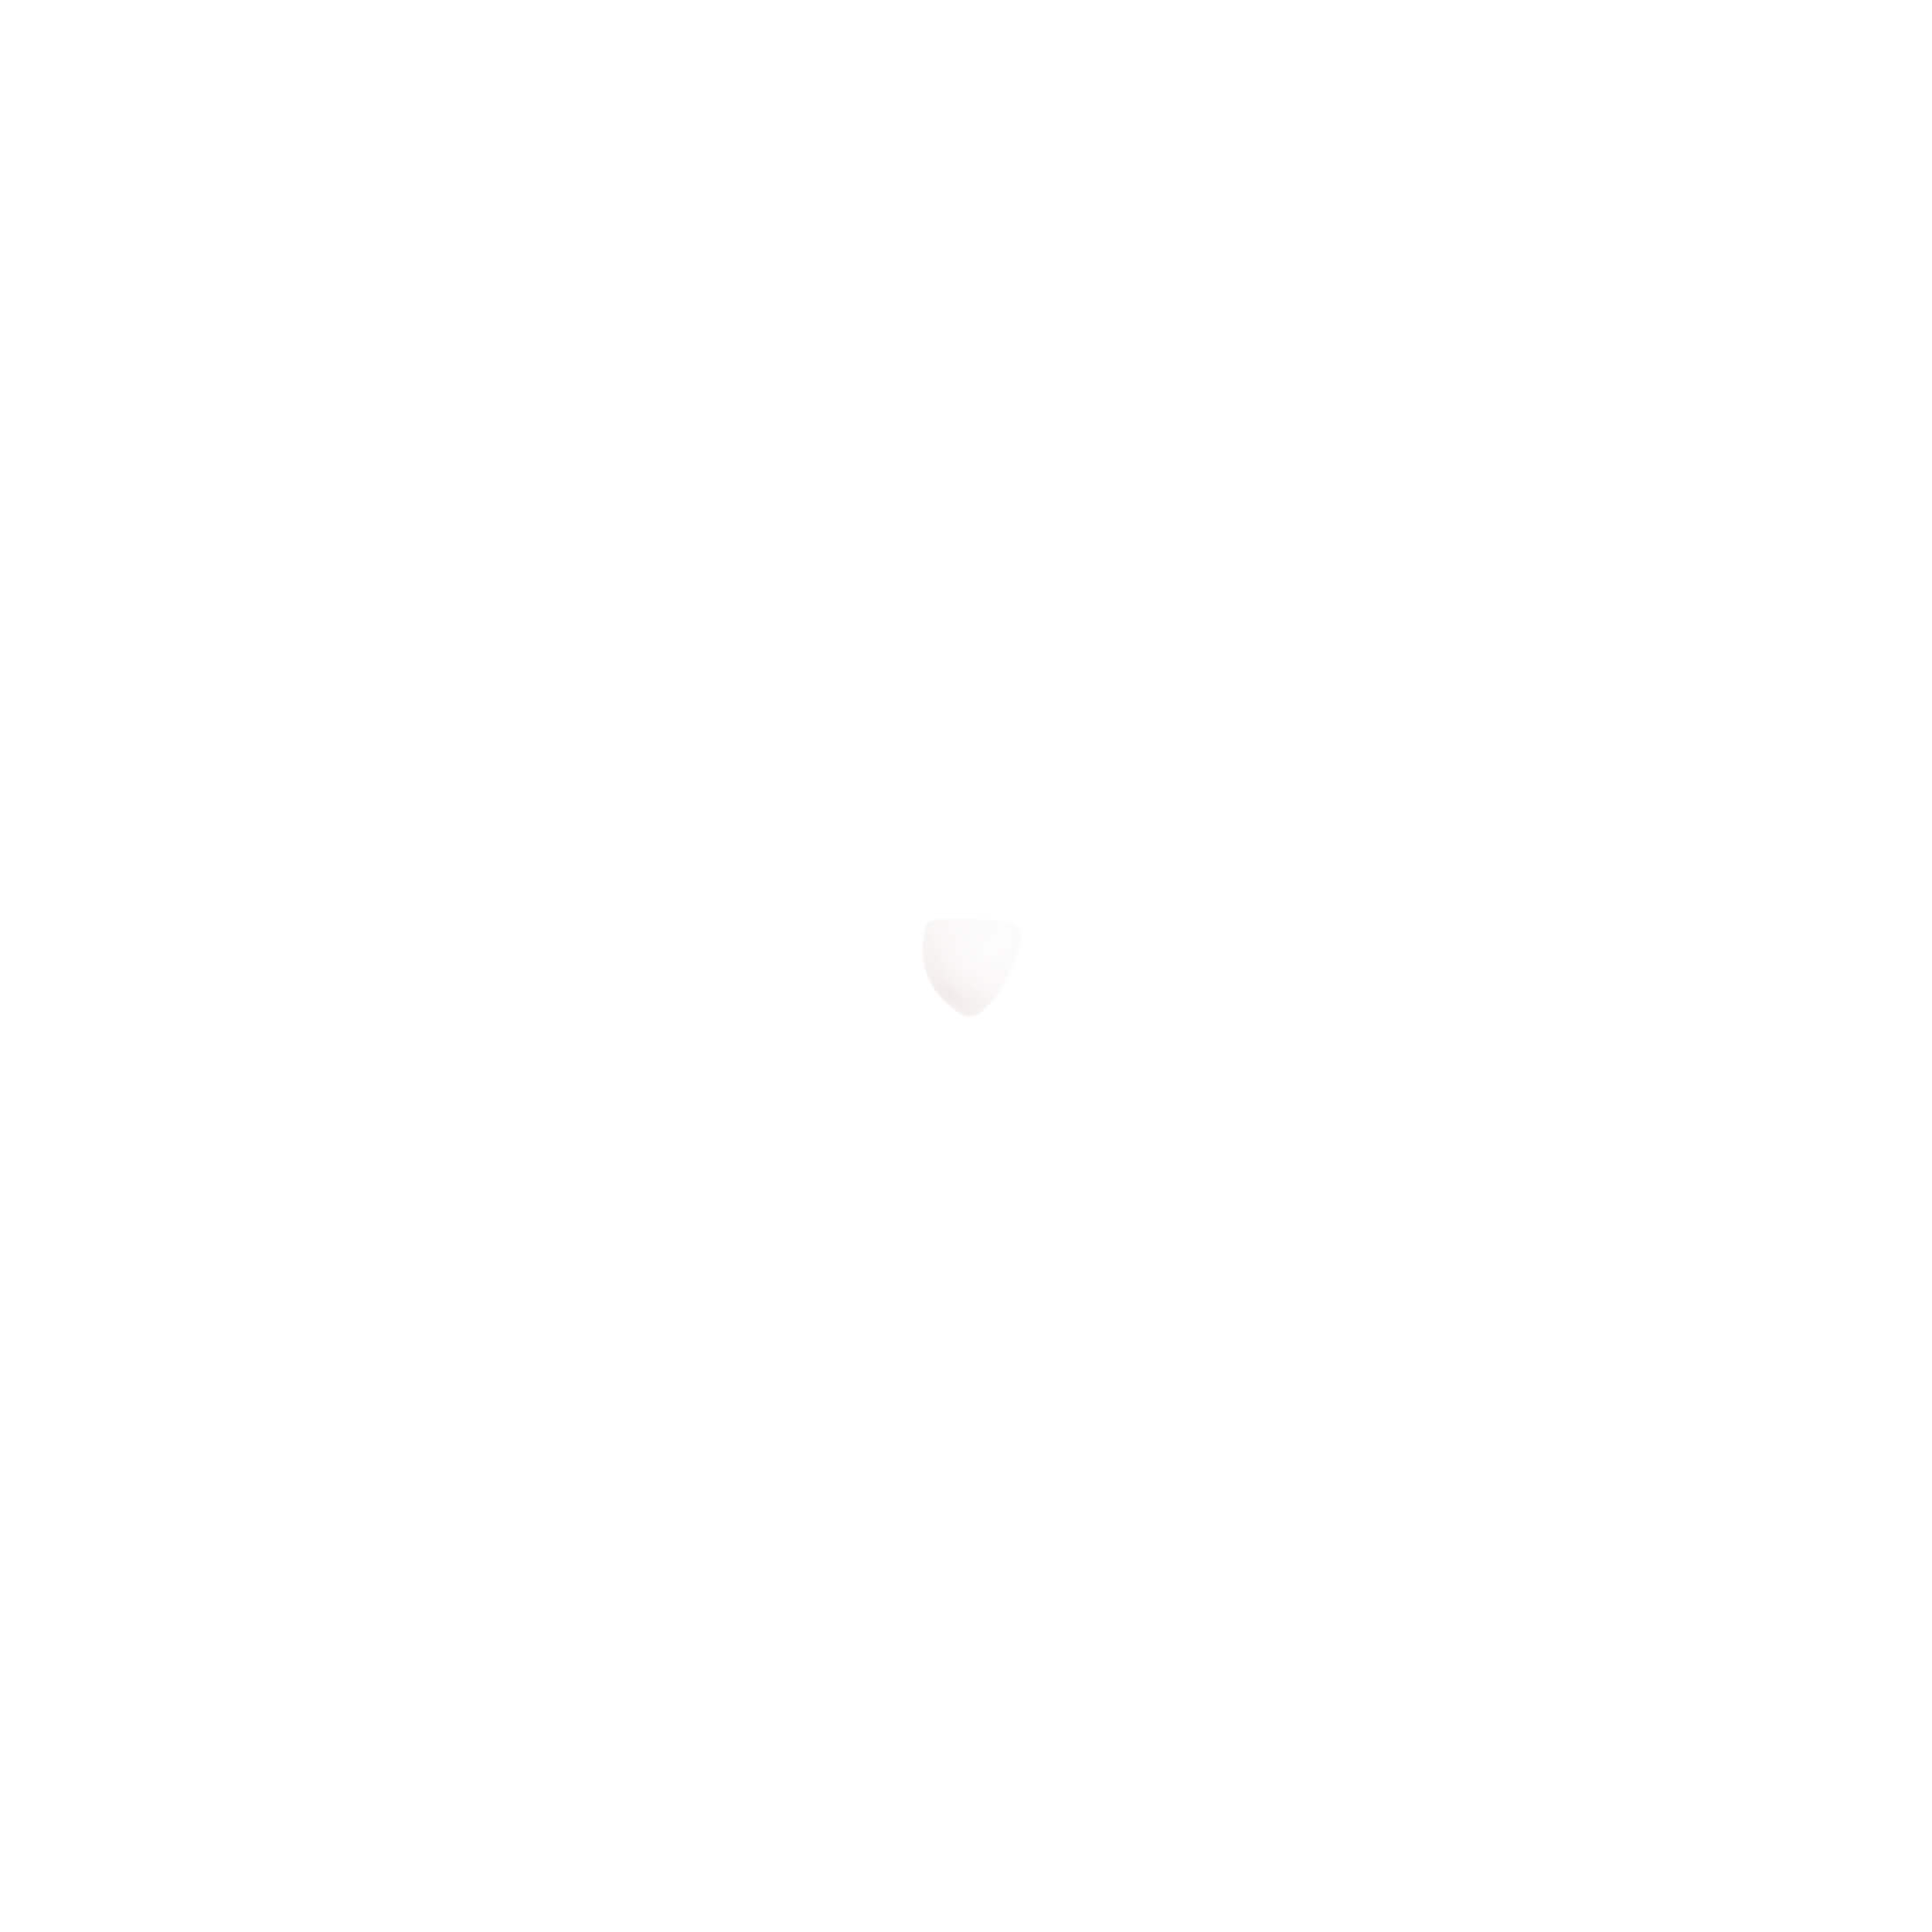 ADEH5004 - ANGULO BULLNOSE TRIM - 1.4 cm X 30 cm